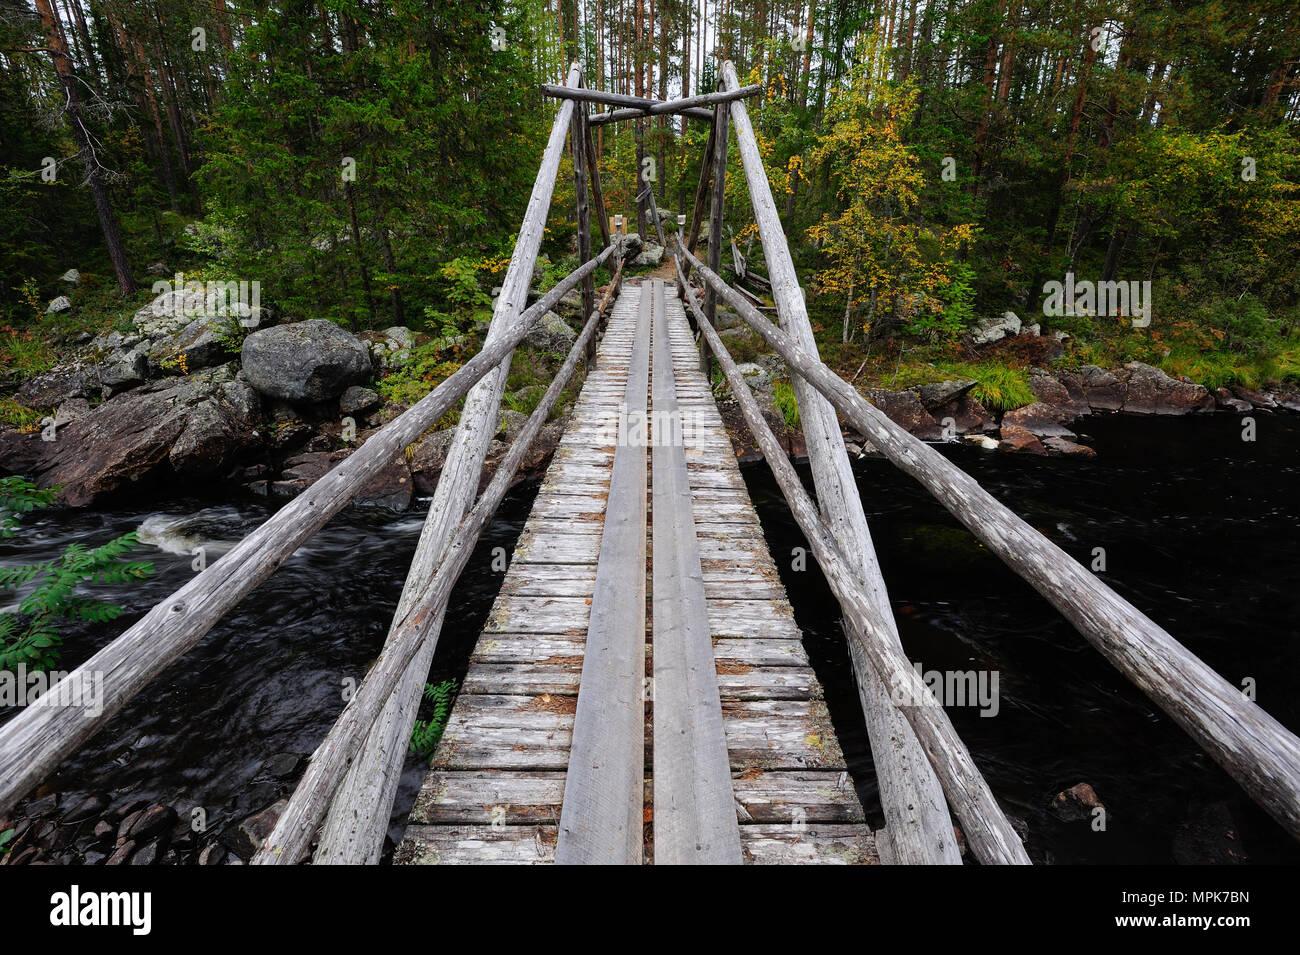 Wood bridge over the wild river, dalarna, sweden - Stock Image